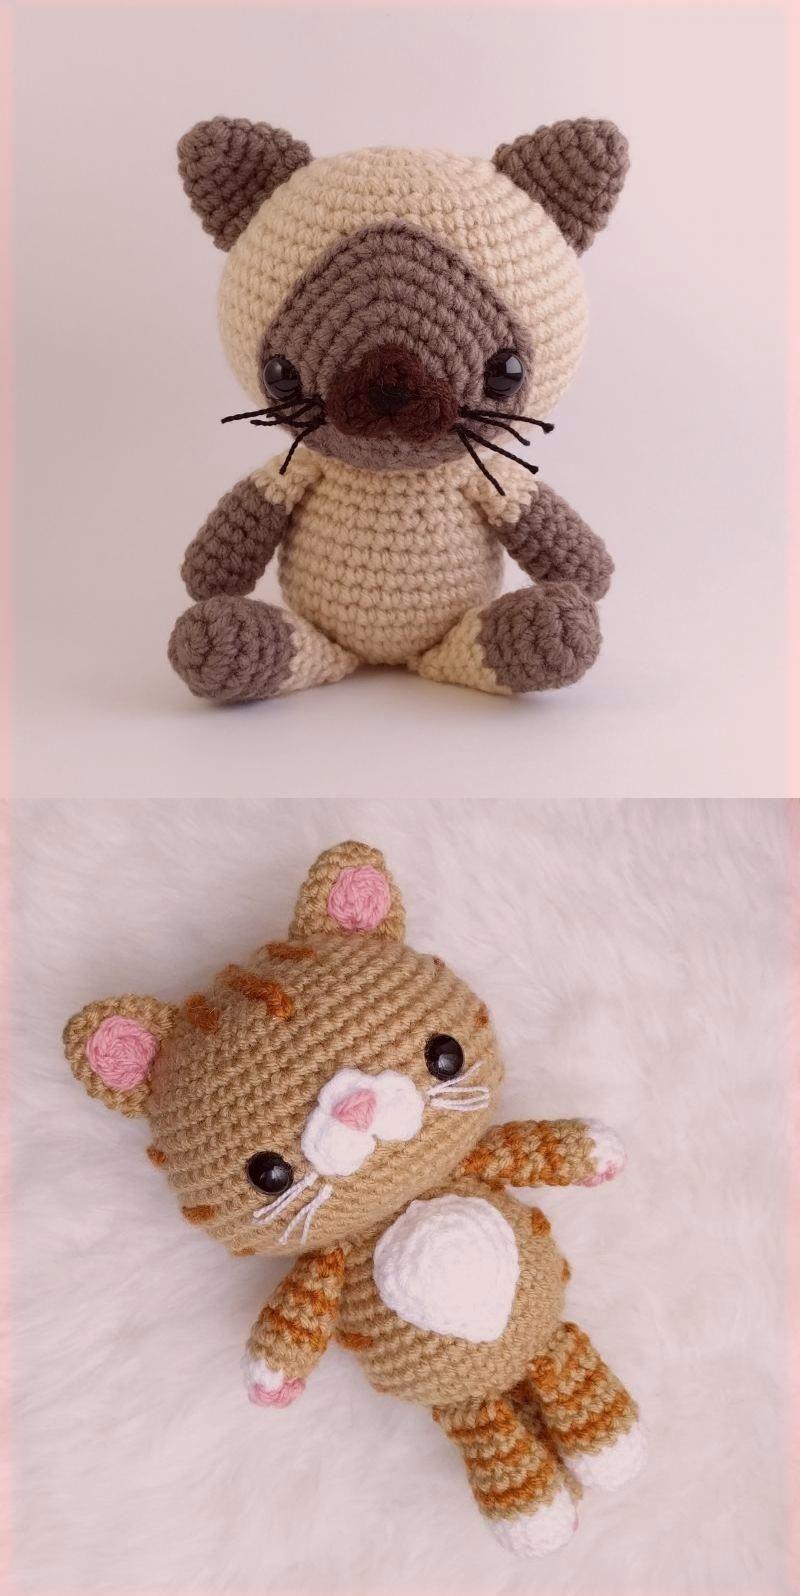 Amigurumi Knitting (Amigurumi) Hello Kitty Cat Making Part 4 – Arm ... | 1596x800